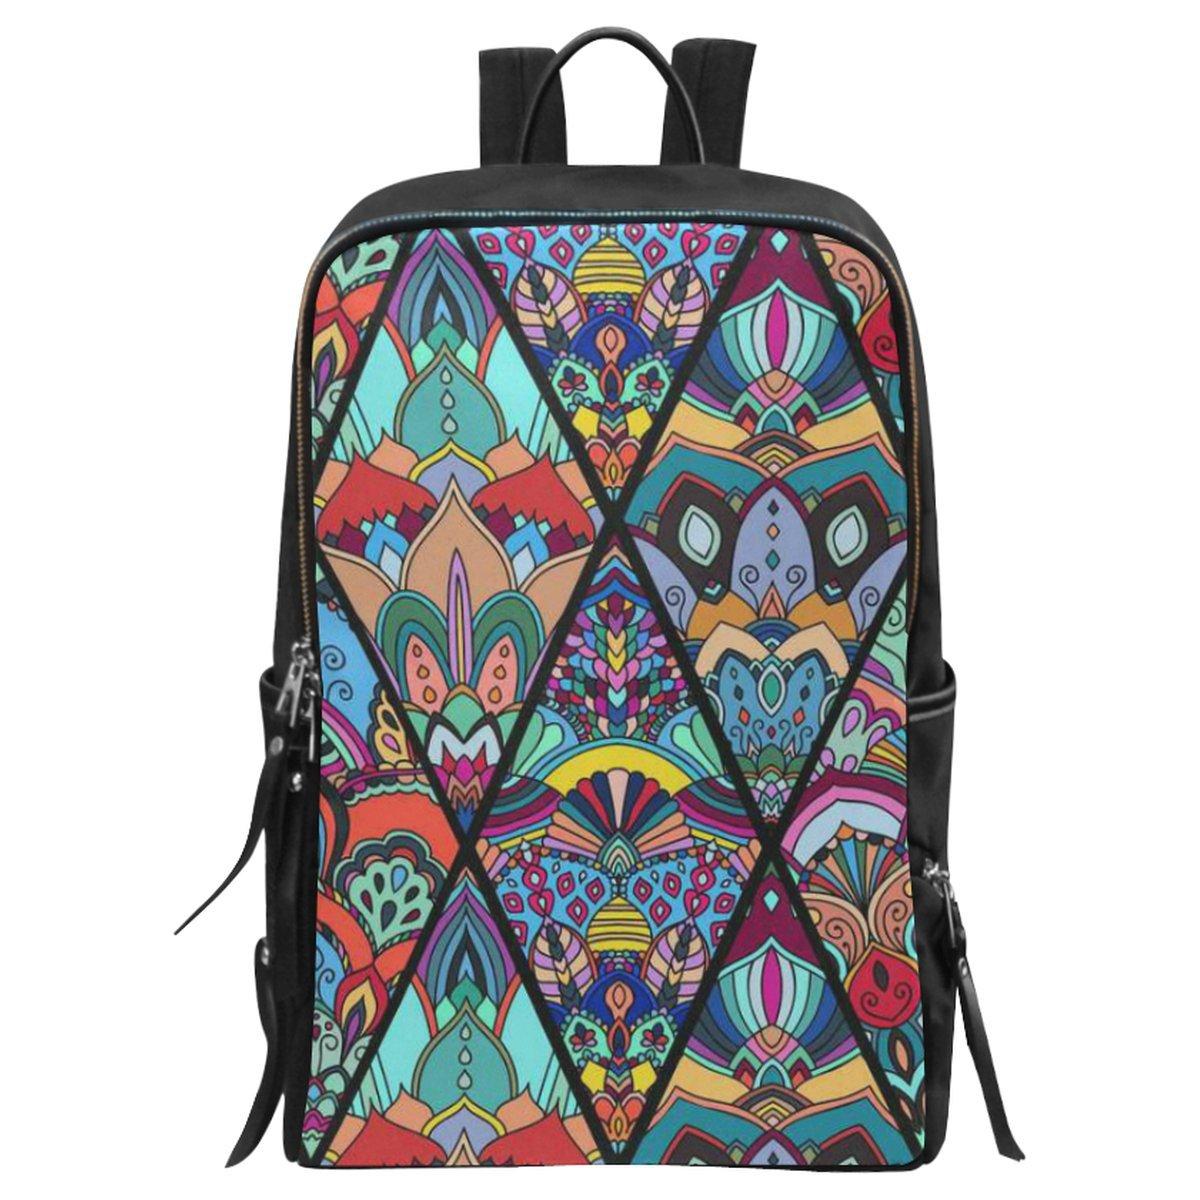 740b17442113 chic InterestPrint Boho Flower Mandala School Casual Travel Backpack School  Bag Travel Daypack